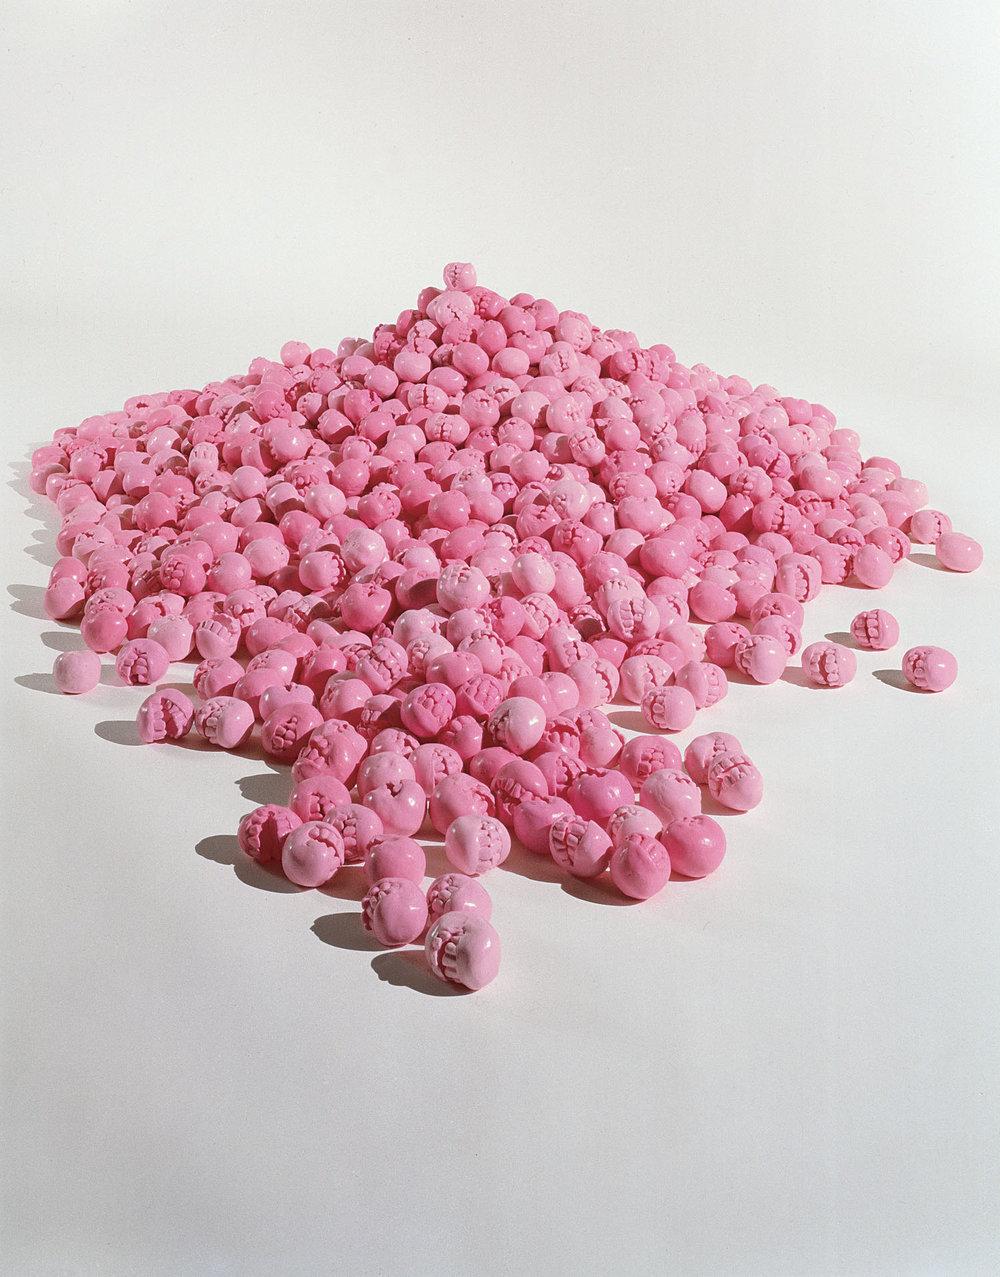 01_pink_treats.jpg